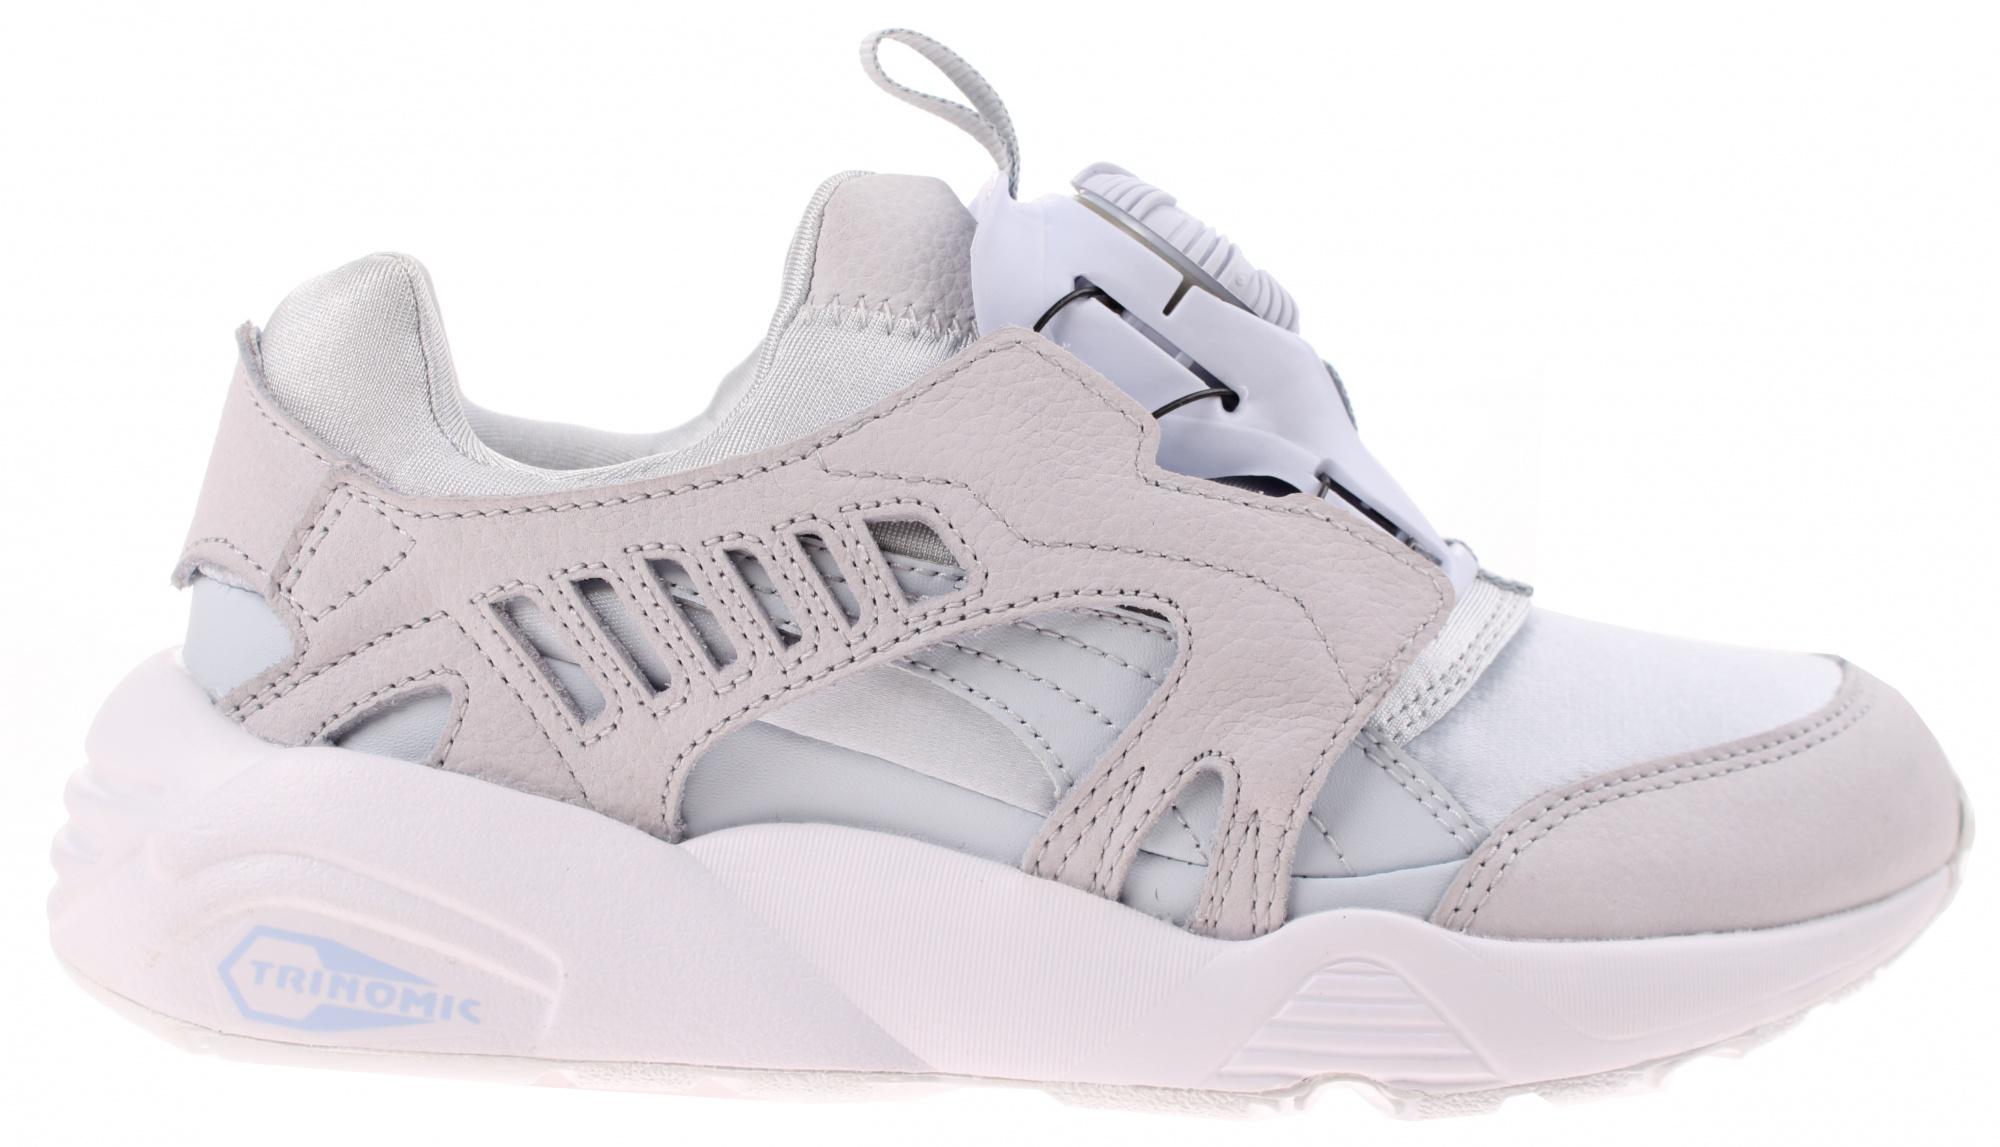 a0fb6a77e74 Puma Sneakers Disc Blaze Shine Gray Ladies - Internet-Sport&Casuals